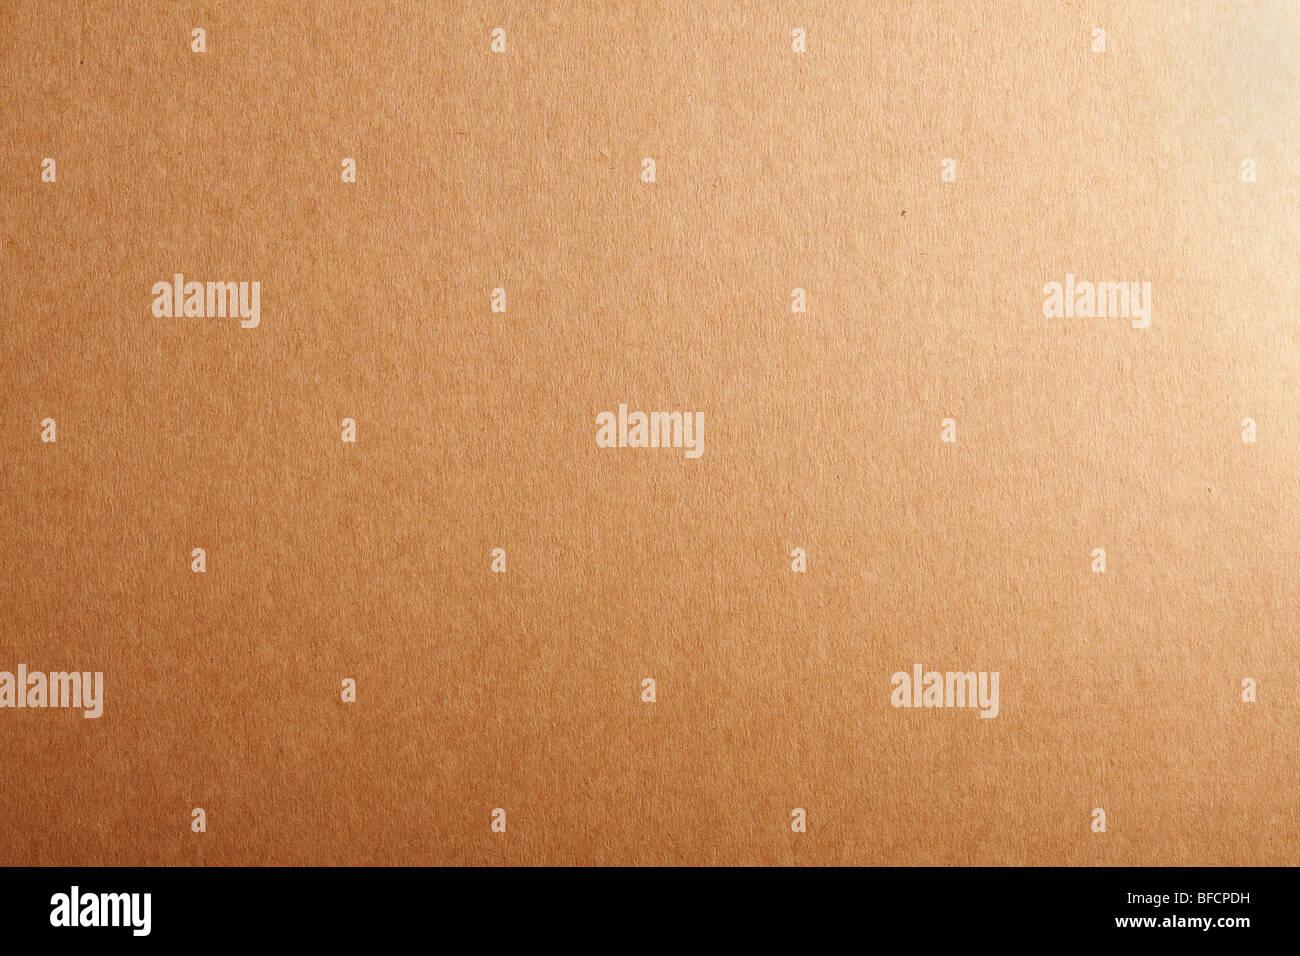 Cartón beige blanco fondo de textura. Imagen De Stock